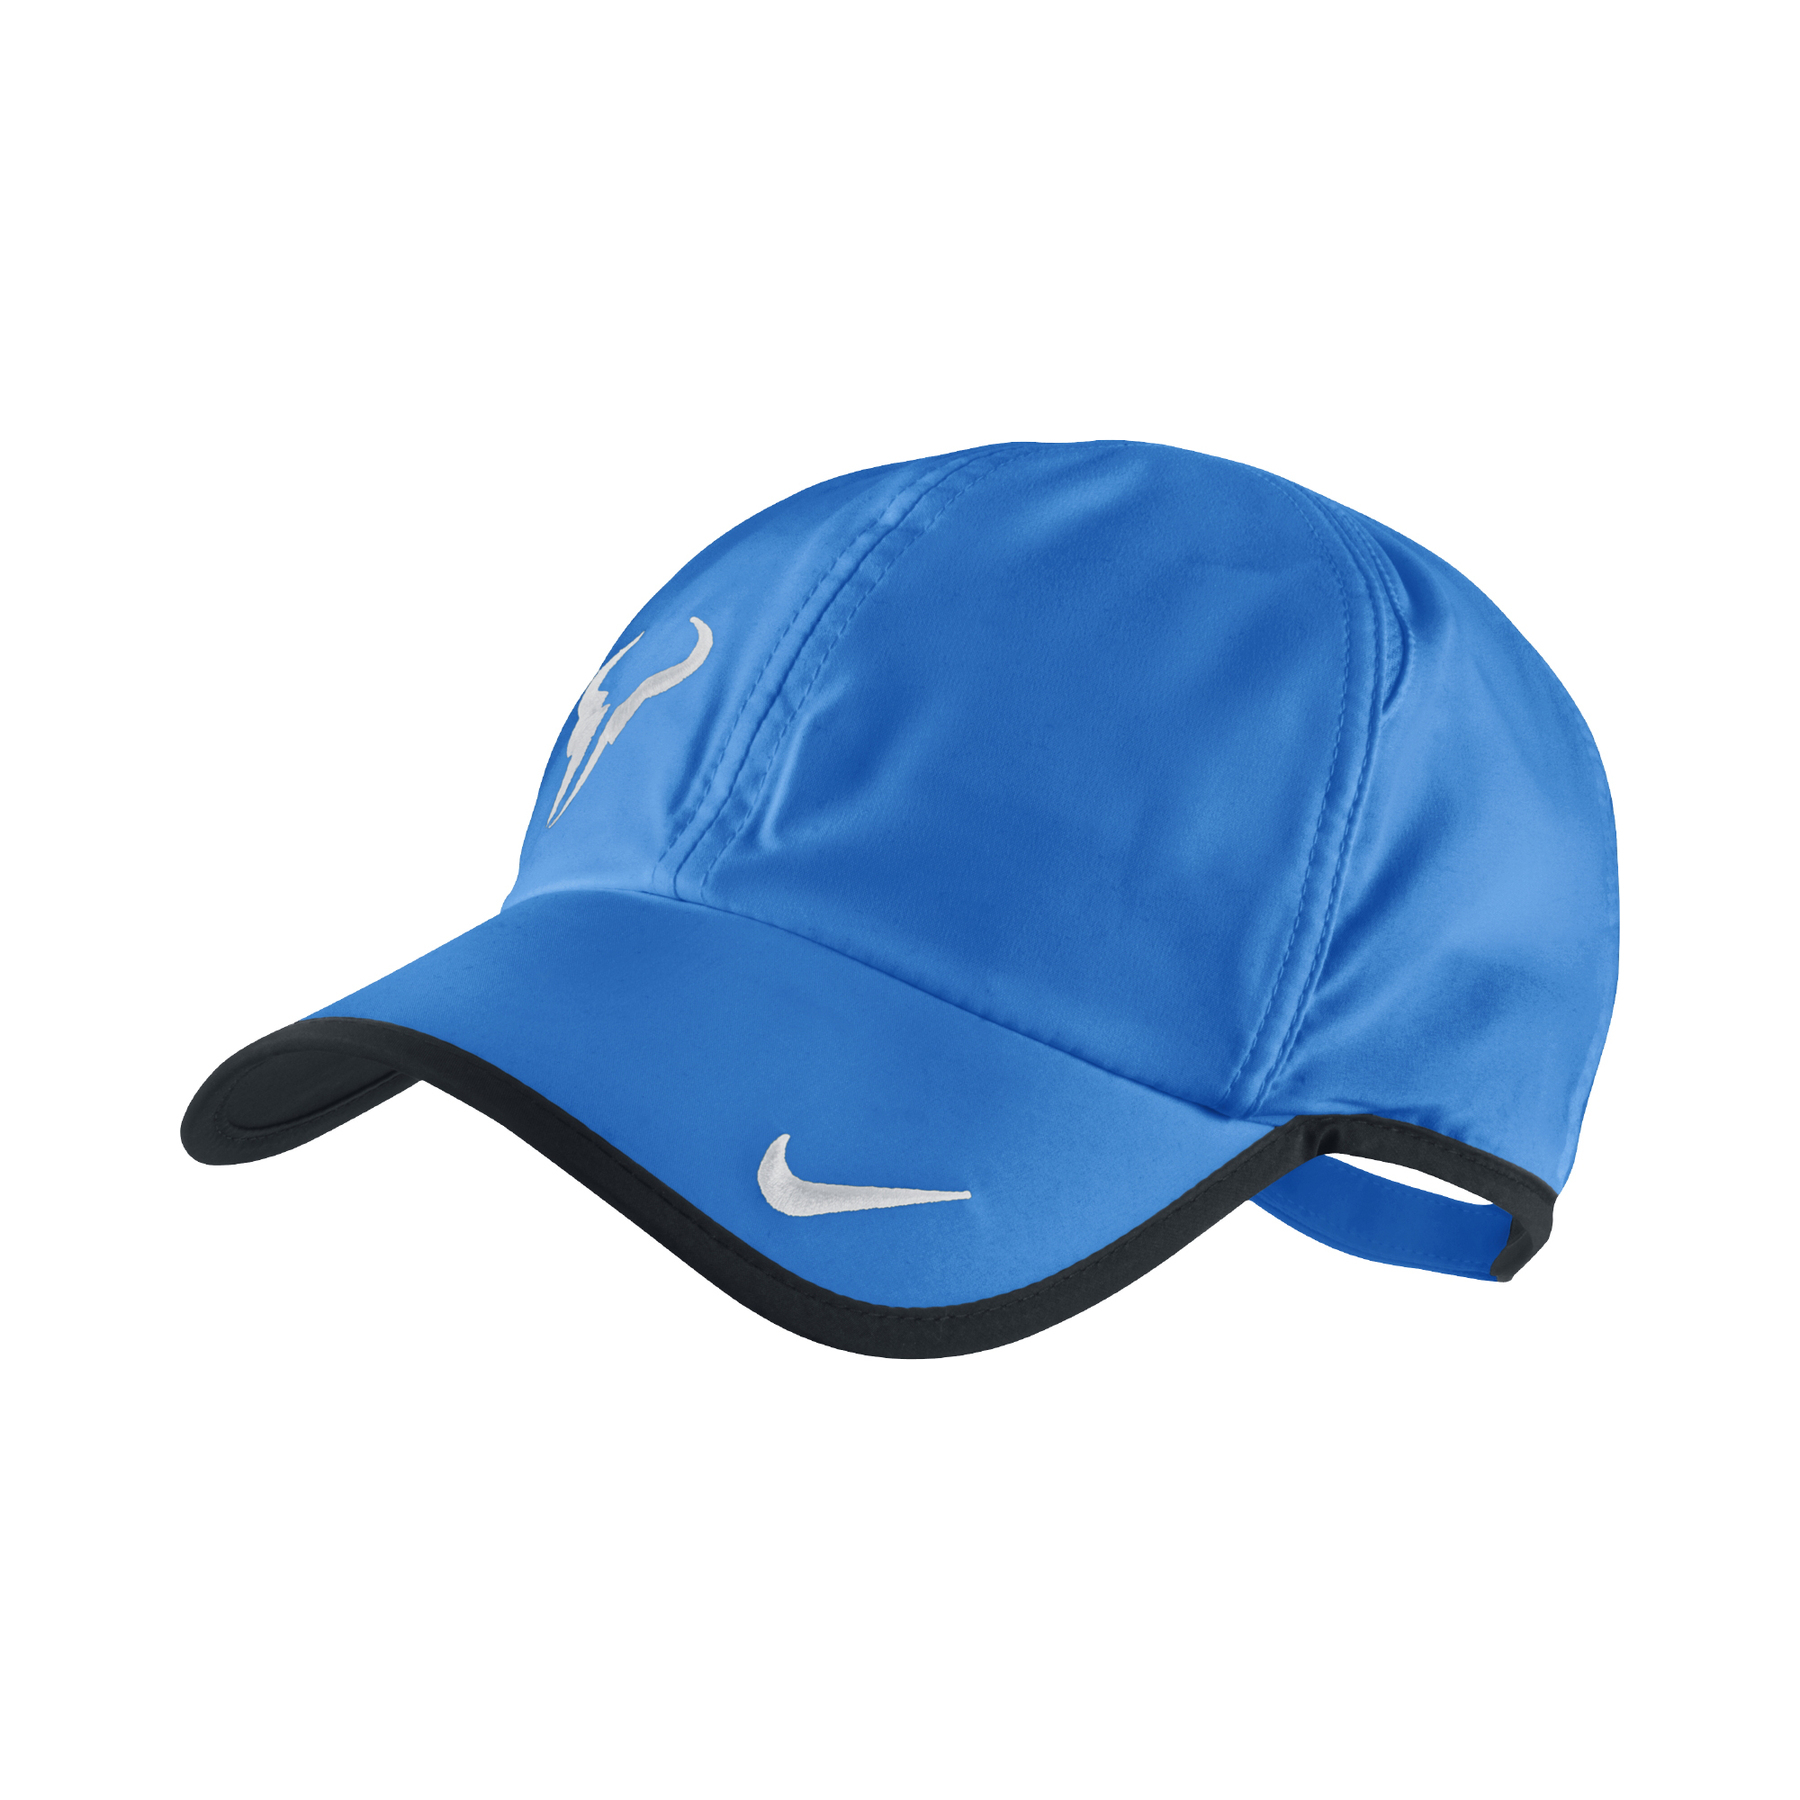 nike rafa nadal bull logo casquette bleu su11 tennis v tements de tennis pas cher. Black Bedroom Furniture Sets. Home Design Ideas